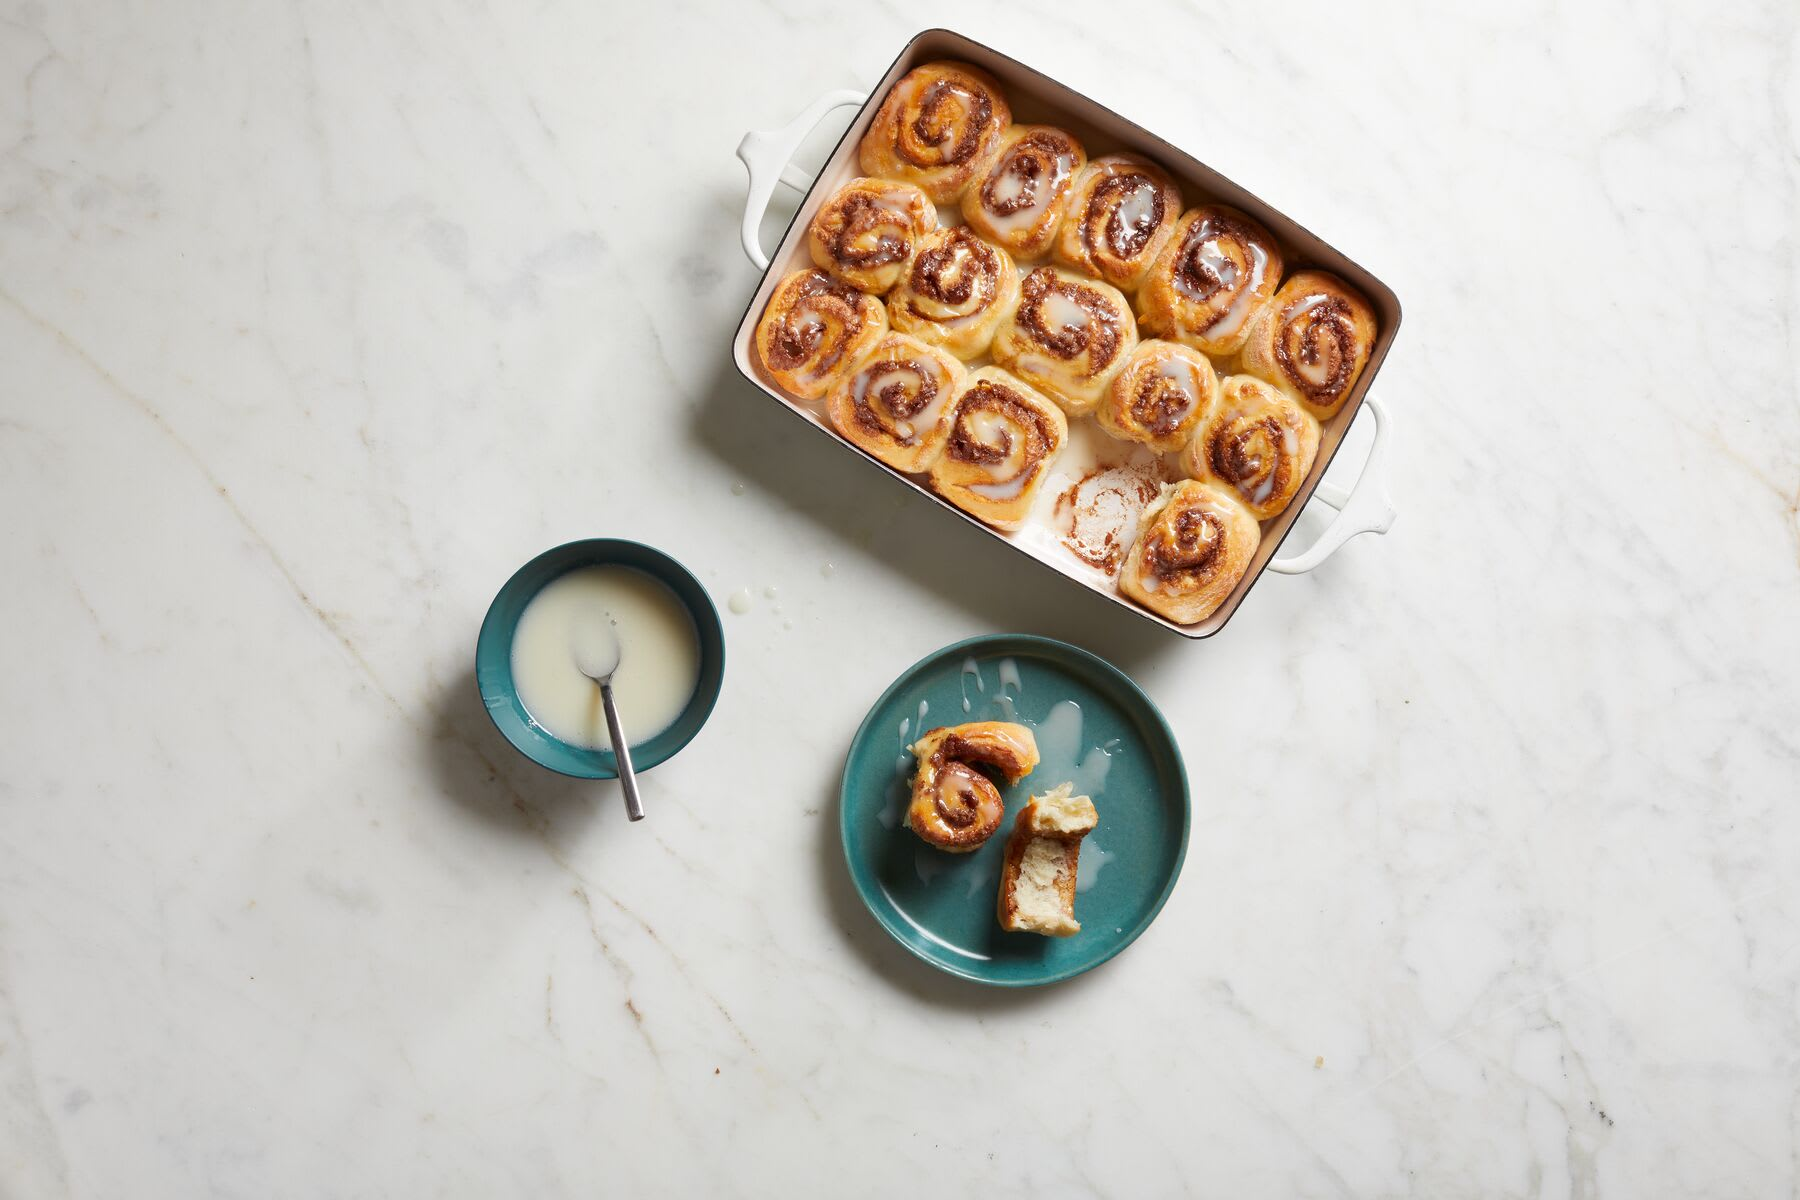 Photo of Cinnamon rolls by WW